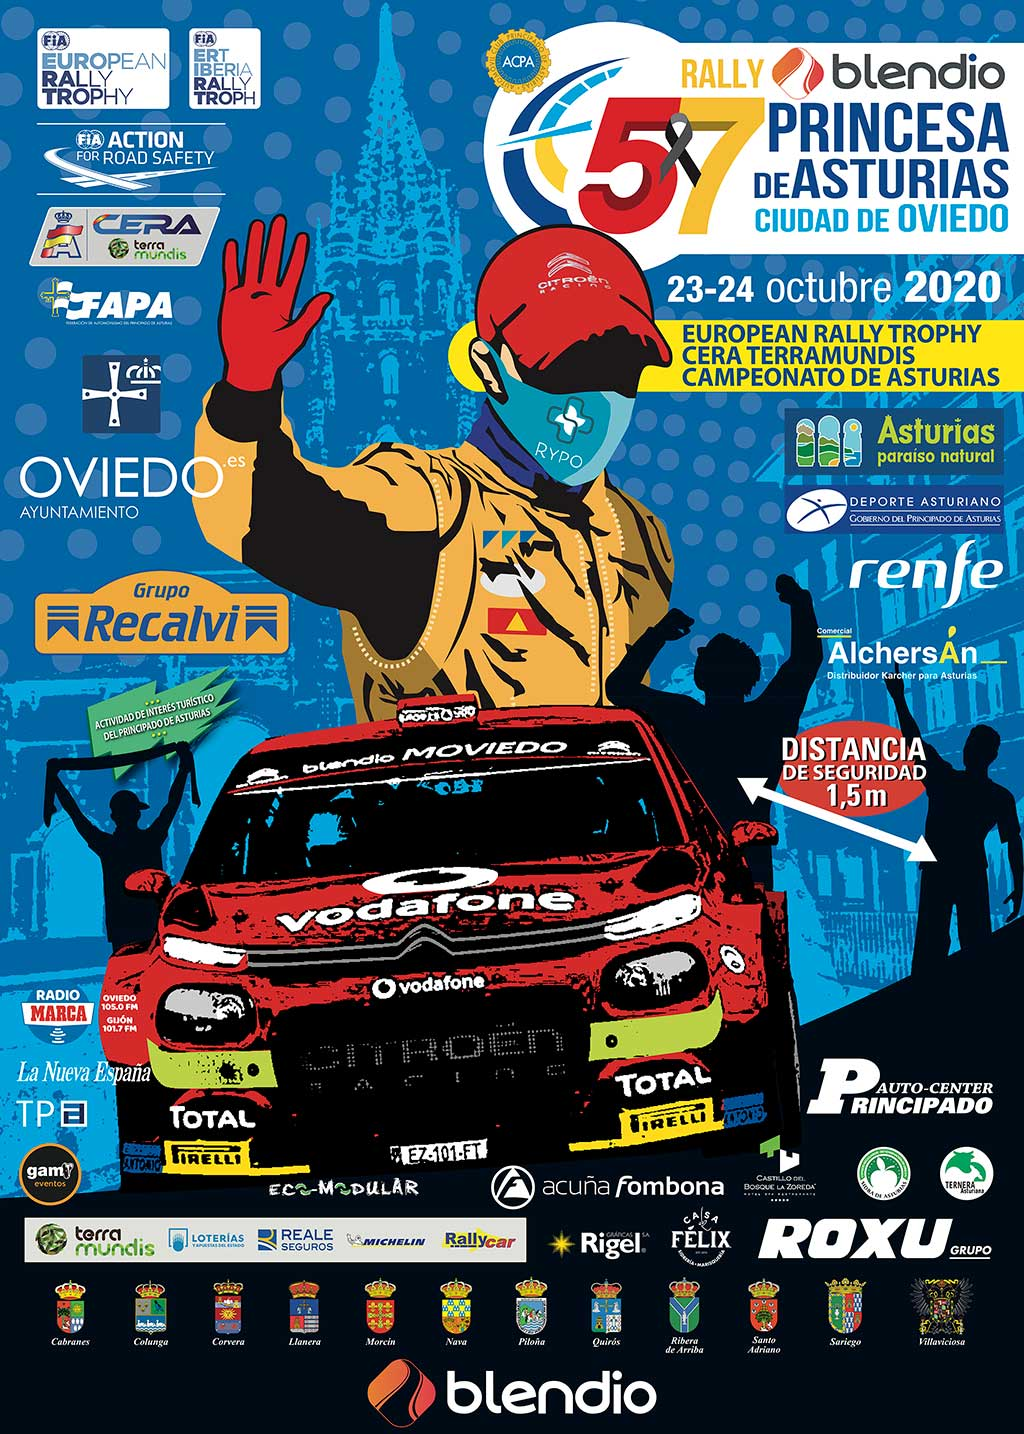 CERA + ERT: 57º Rallye Princesa de Asturias - Ciudad de Oviedo [23-24 Octubre] Cartel